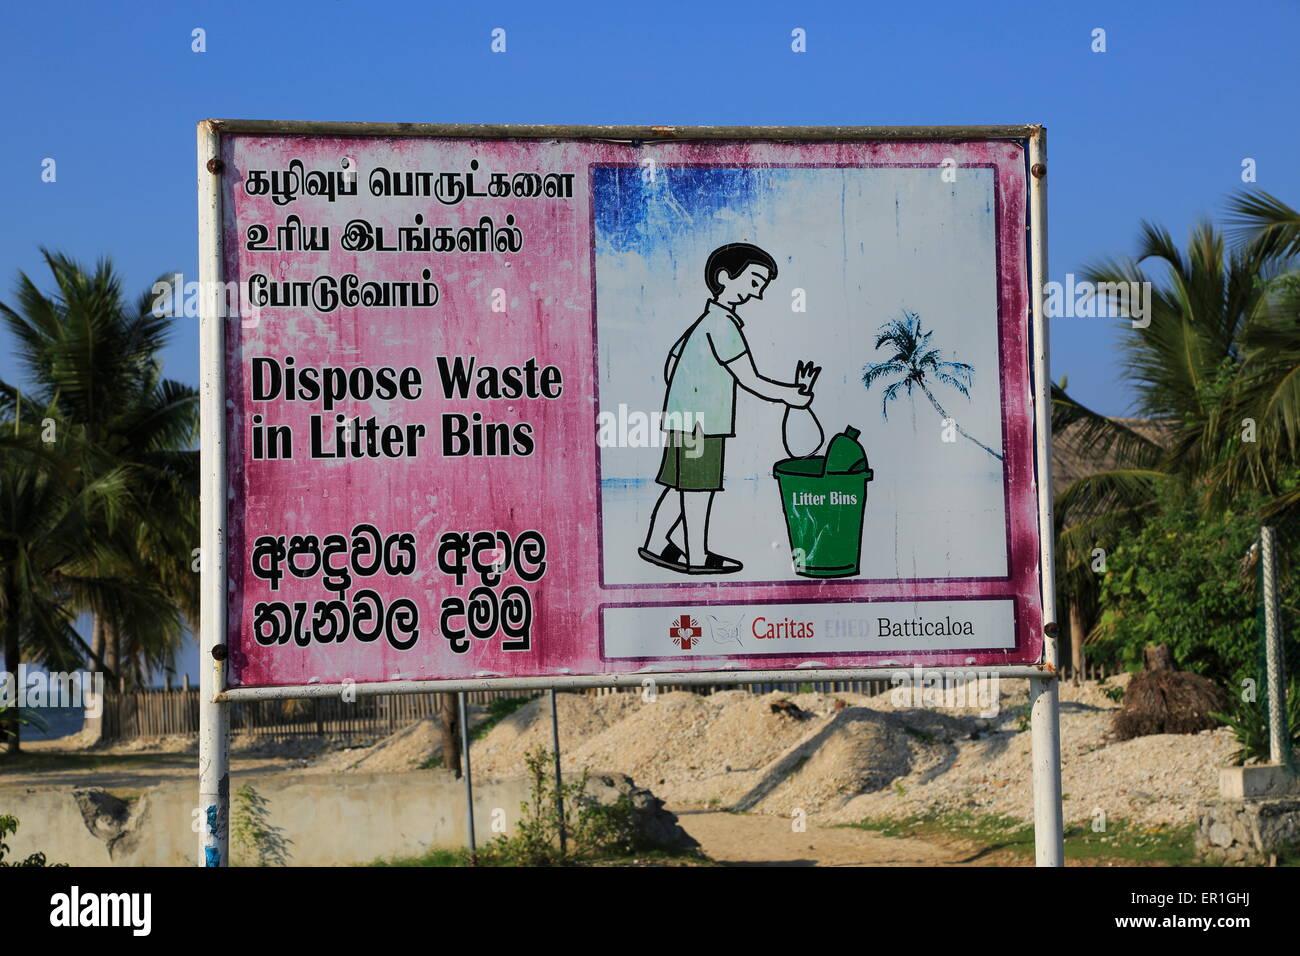 Dispose Waste in Litter Bins sign, Pasikudah Bay, Eastern Province, Sri Lanka, Asia - Stock Image